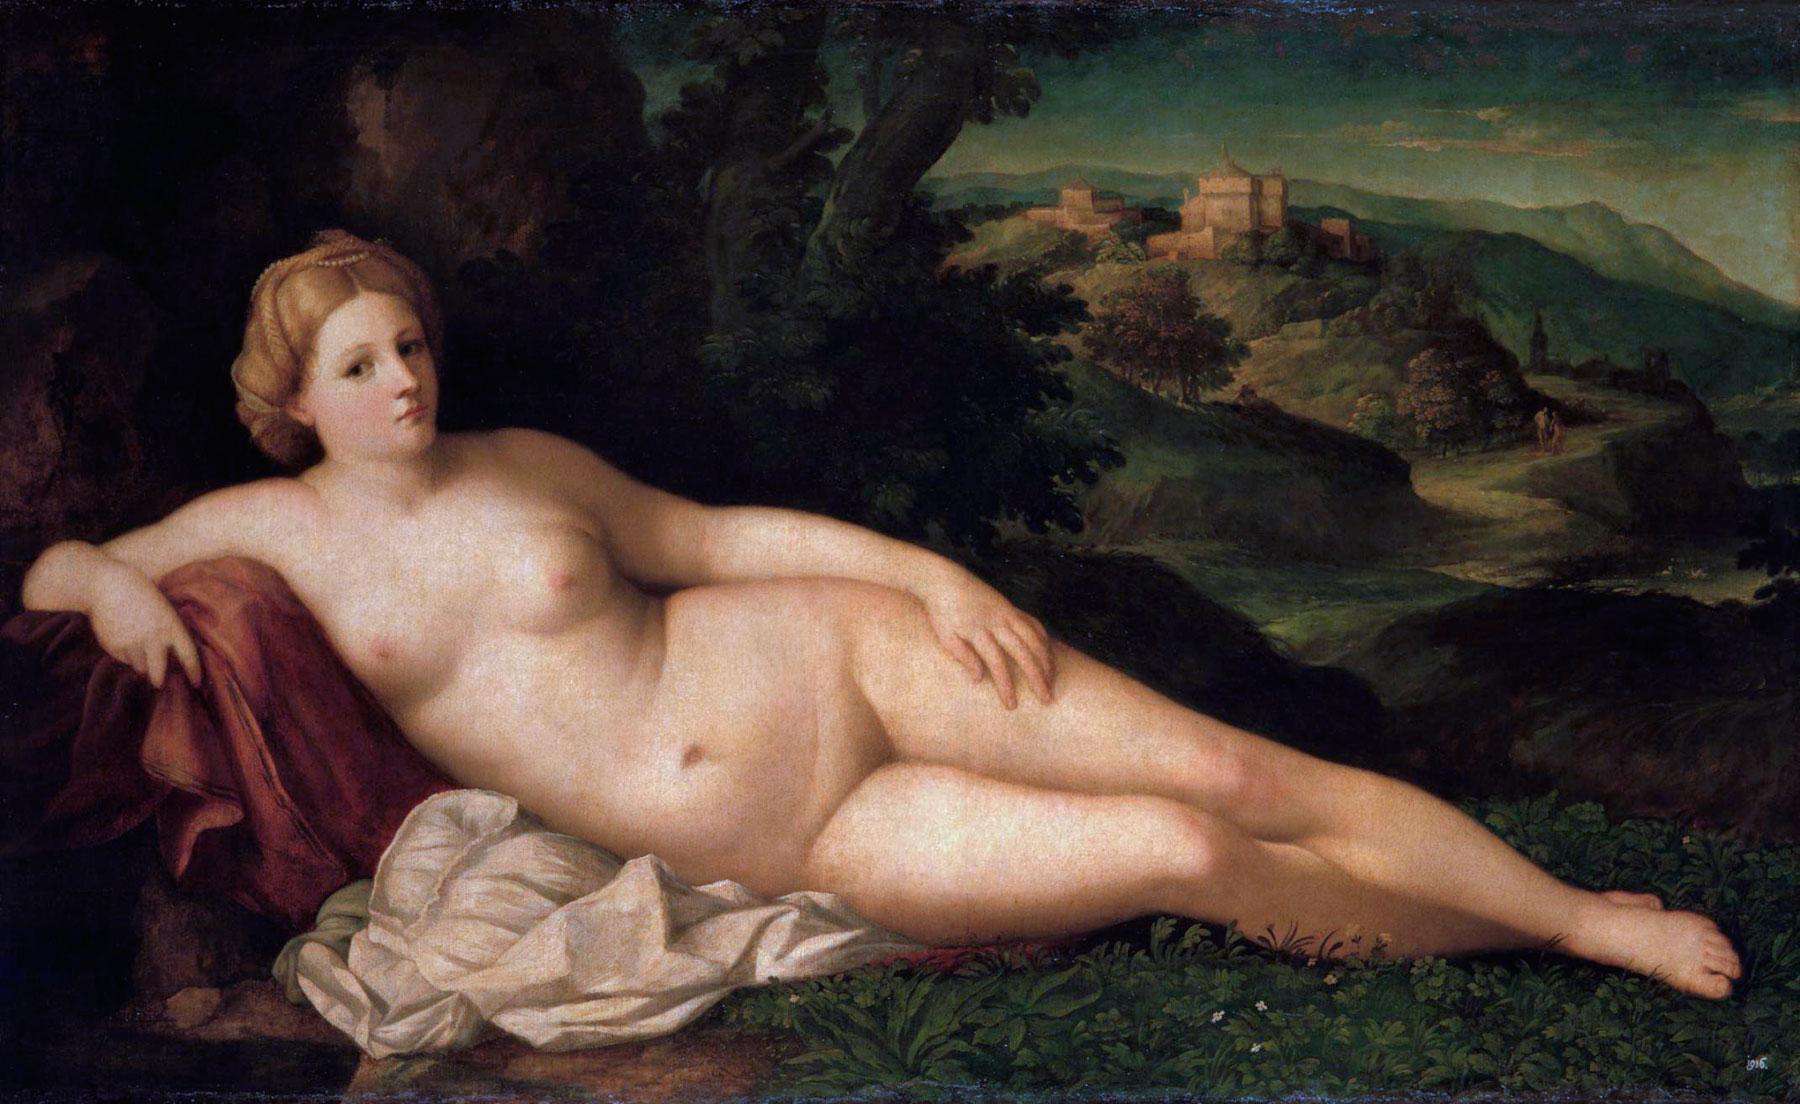 Palma il Vecchio, Ninfa in un paesaggio (1518-1520 circa; olio su tela, 113 x 186 cm; Dresda, Gemäldegalerie)